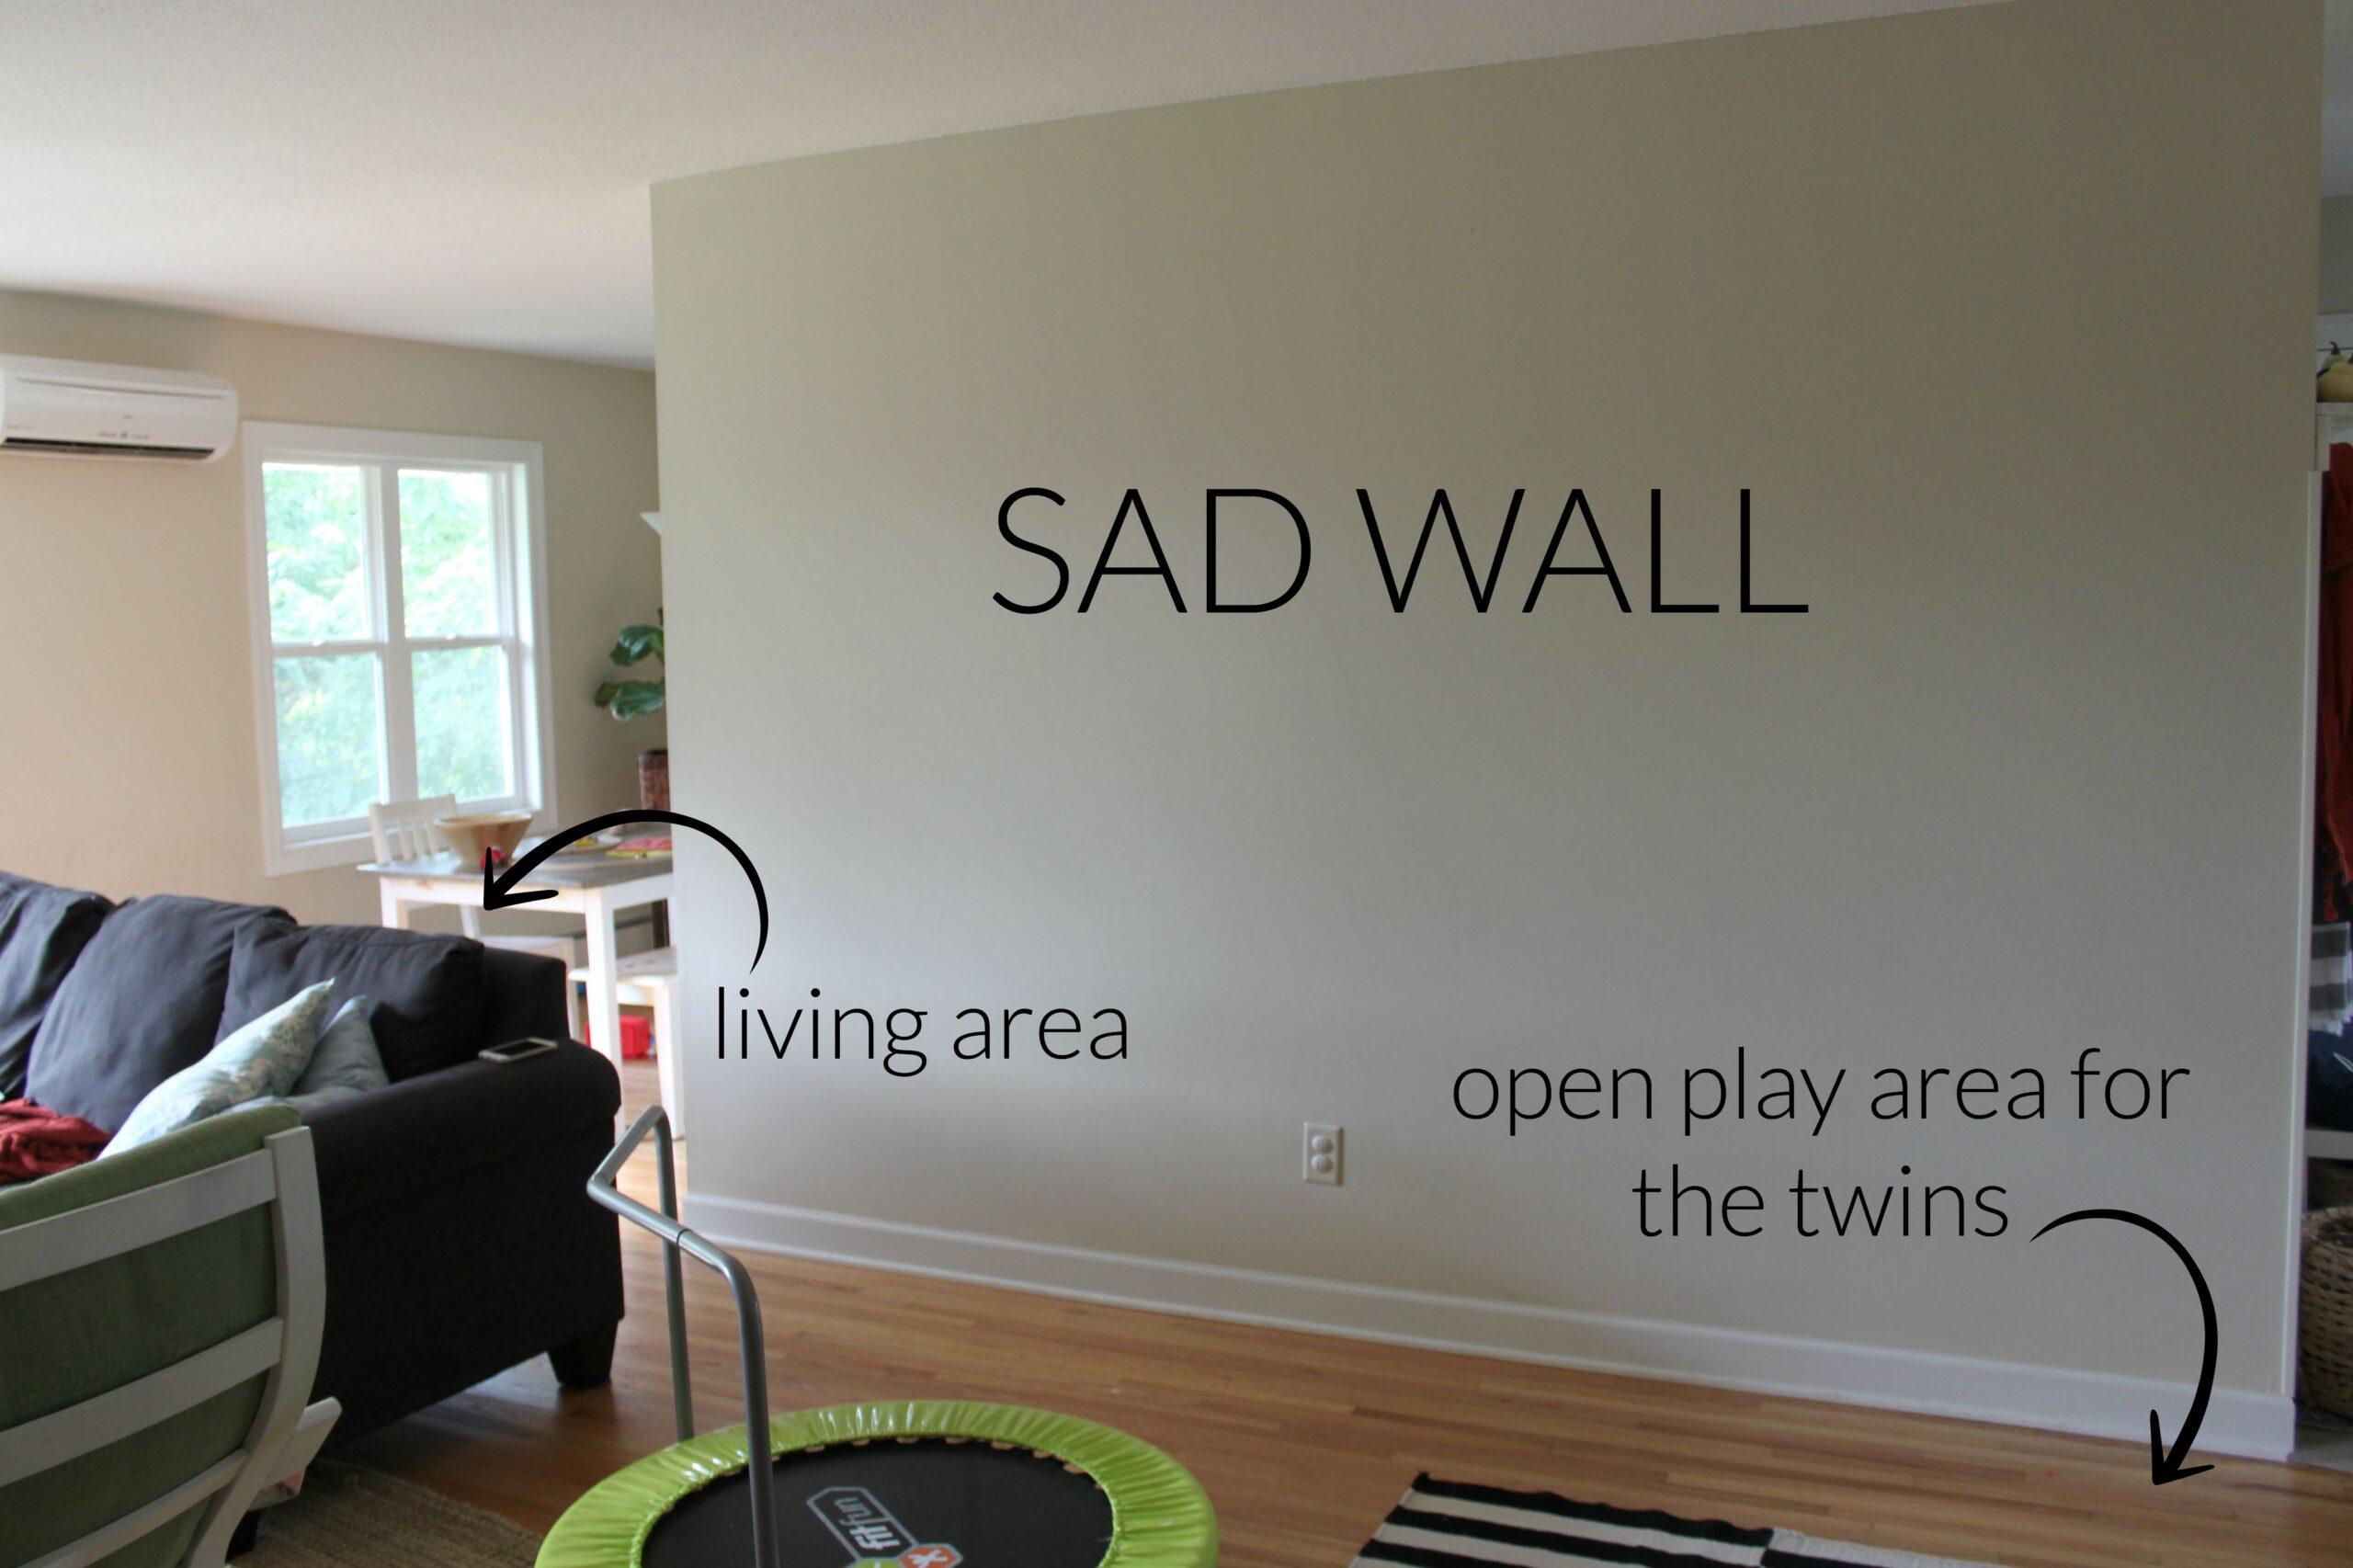 Awesome Decorating Large Walls Protomechgame Com Free Home Designs Photos  Ideas Pokmenpayus Part 54